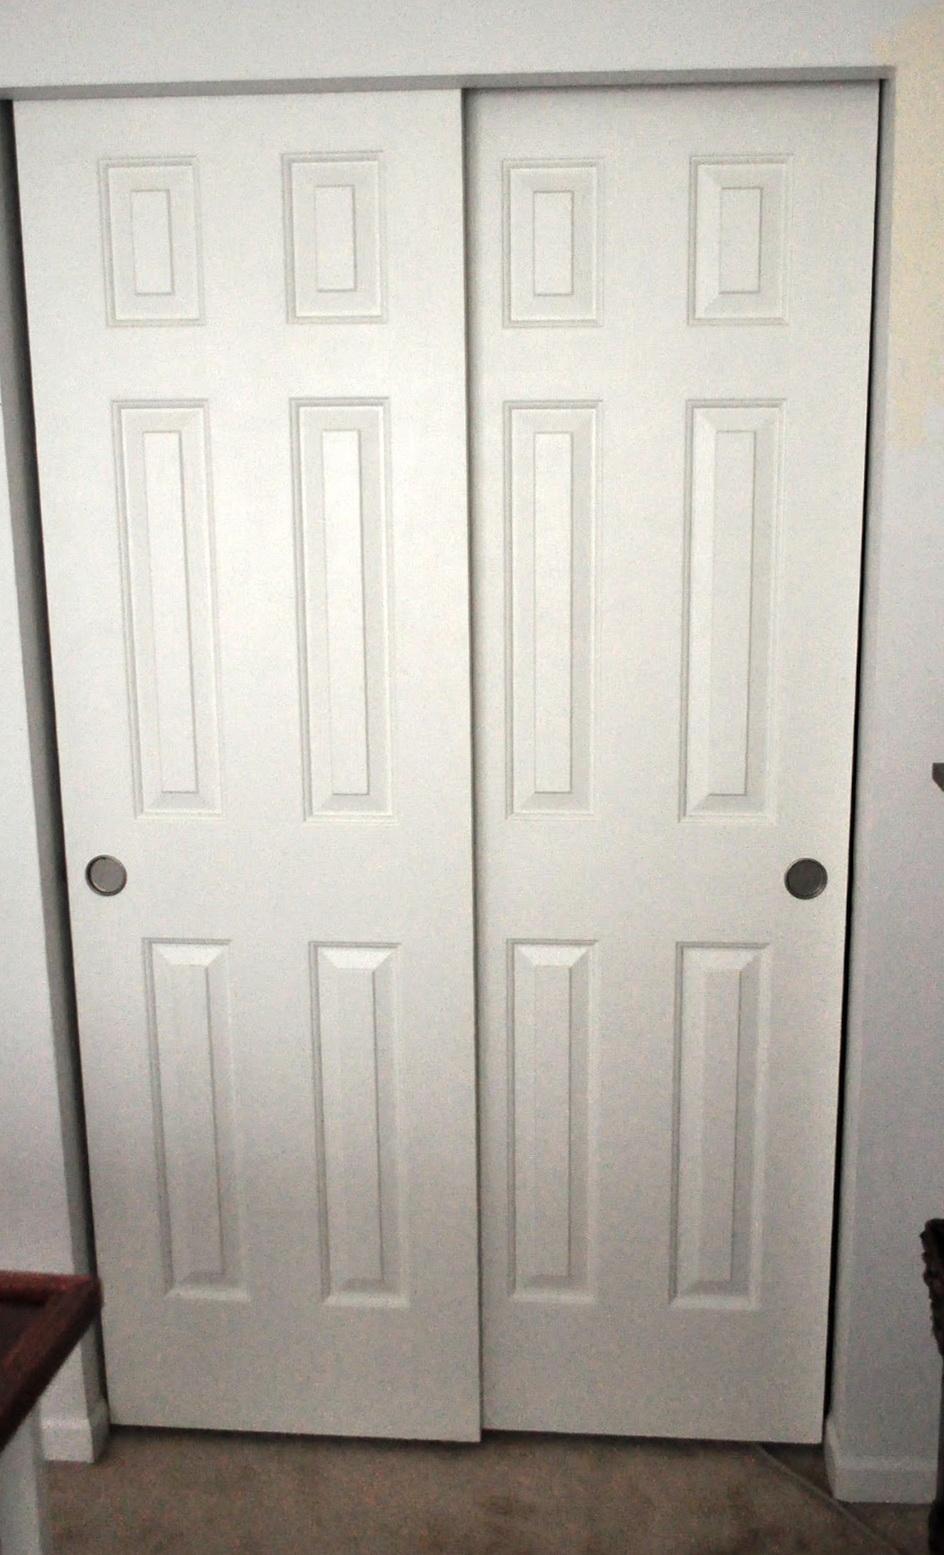 Double Closet Doors Lowes Home Design Ideas